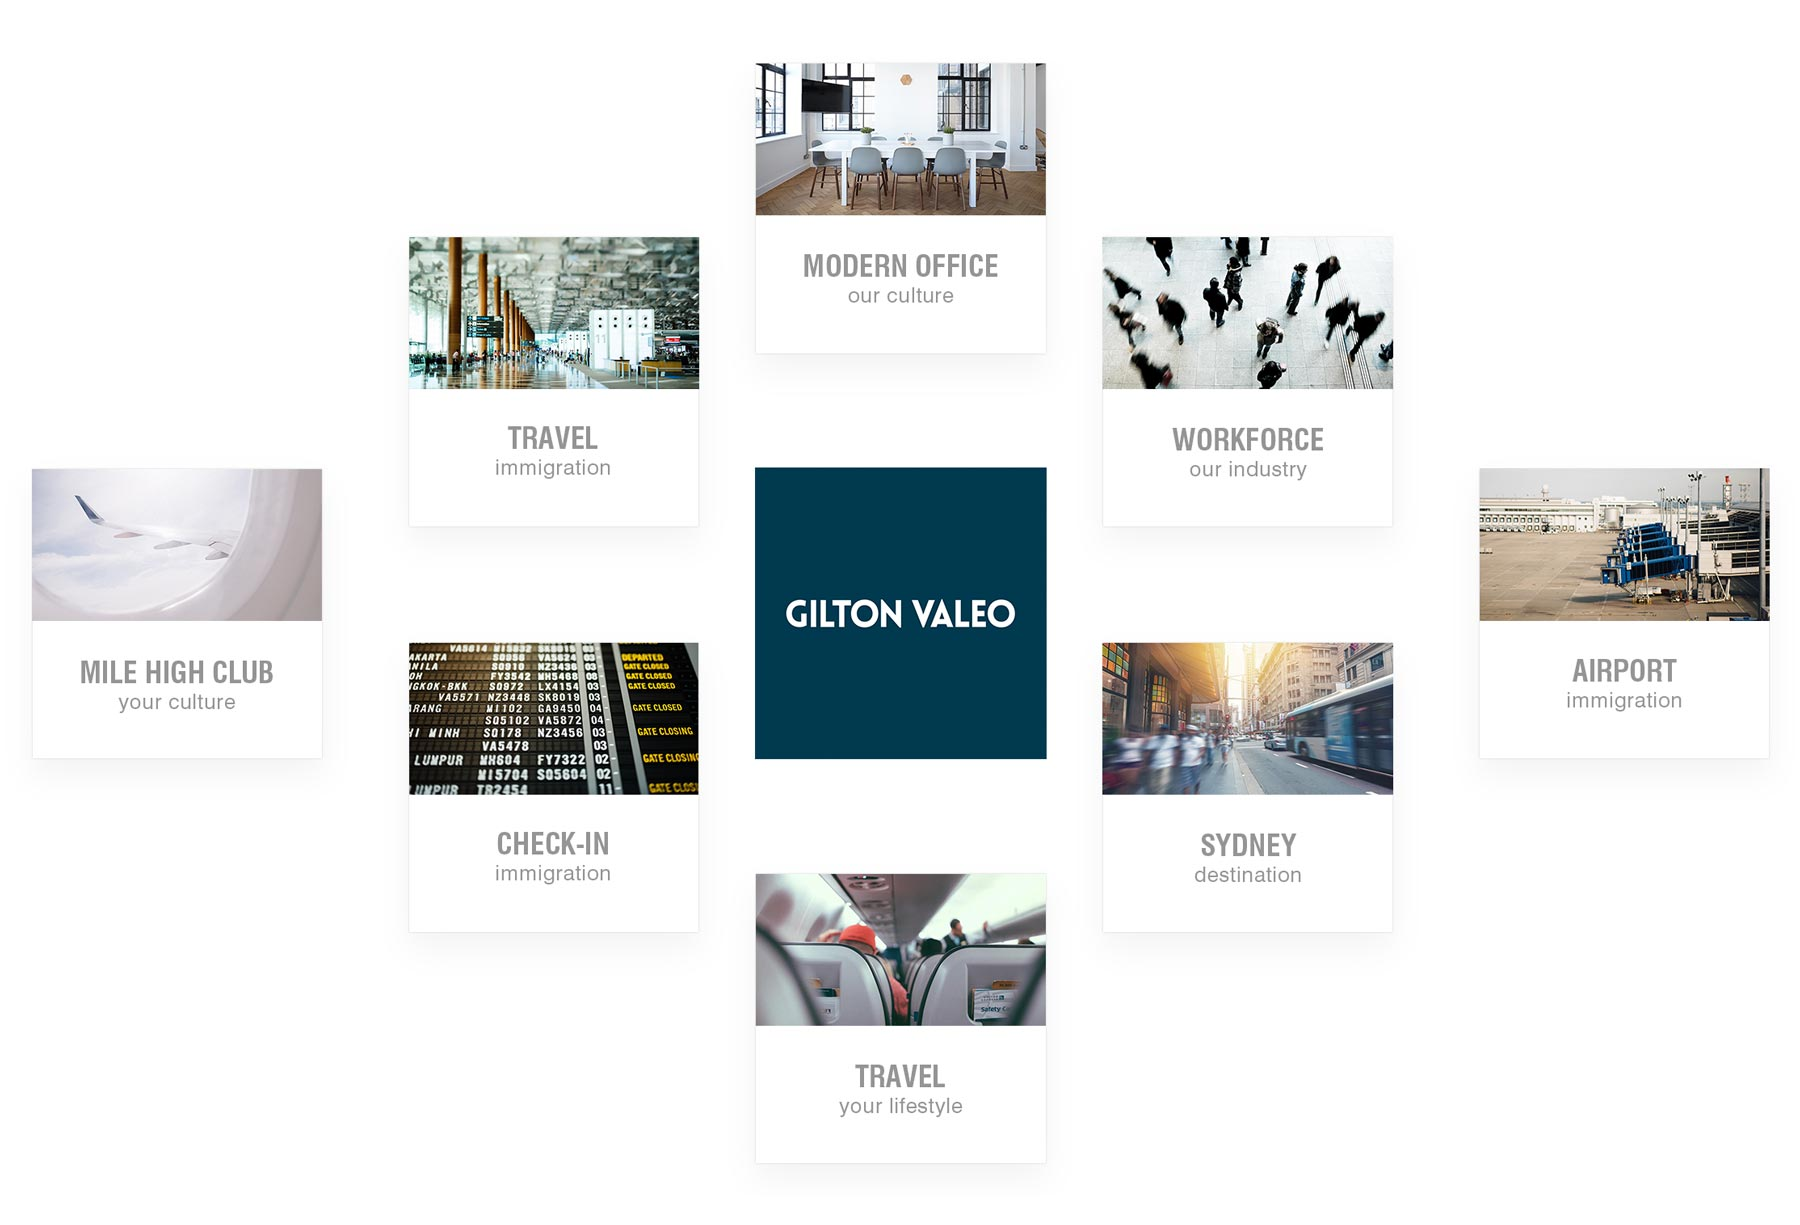 Immigration Law Firm Gilton Valeo Brand Matrix